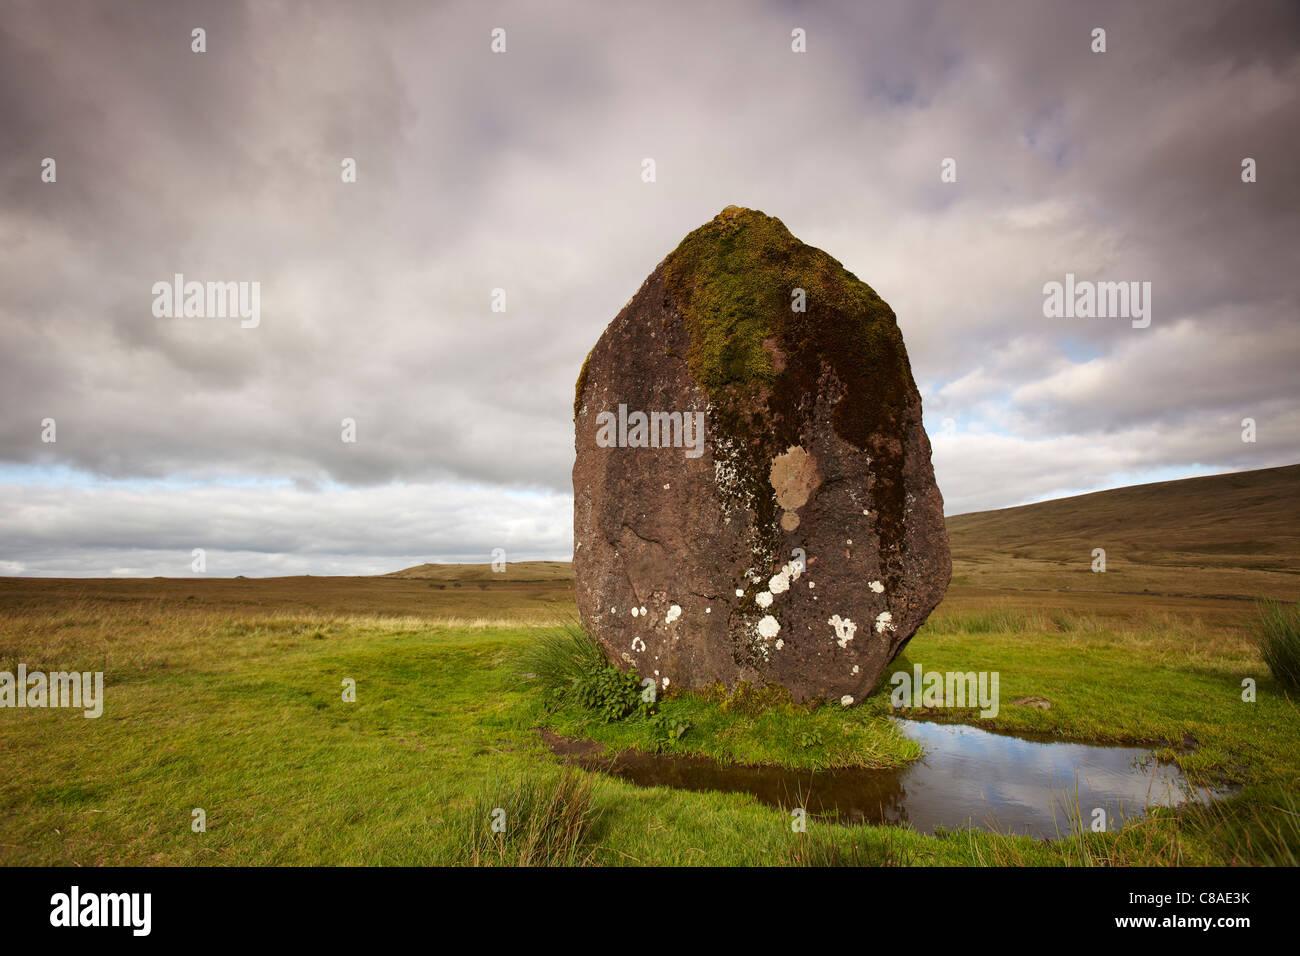 Maen Llia Neolithic Standing Stone, Ystradgynlais, Swansea Valley, Wales, UK - Stock Image